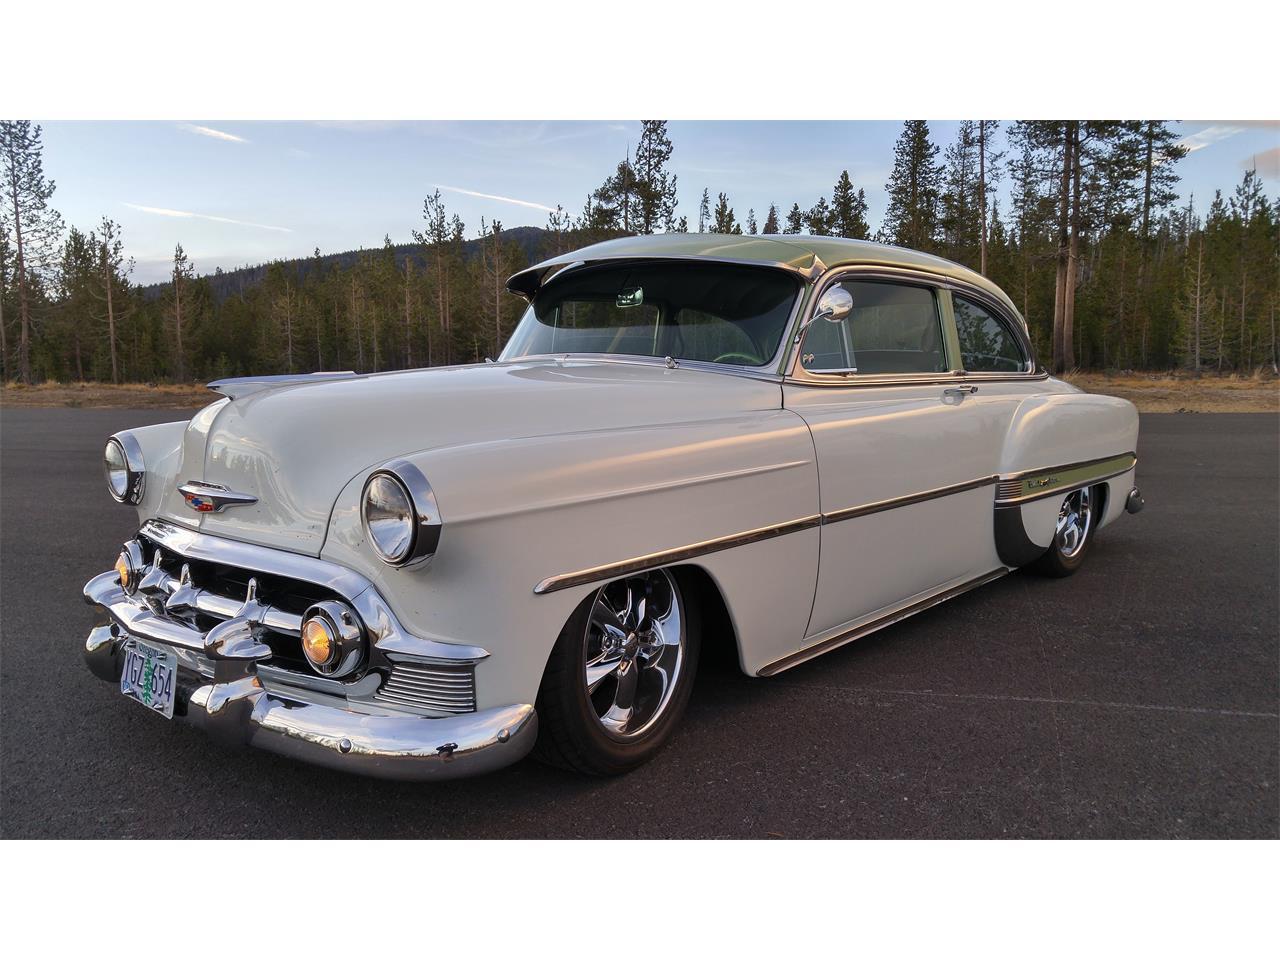 1953 Chevy 53 Chevrolet BEL AIR CLEAR  2P BU light NEW